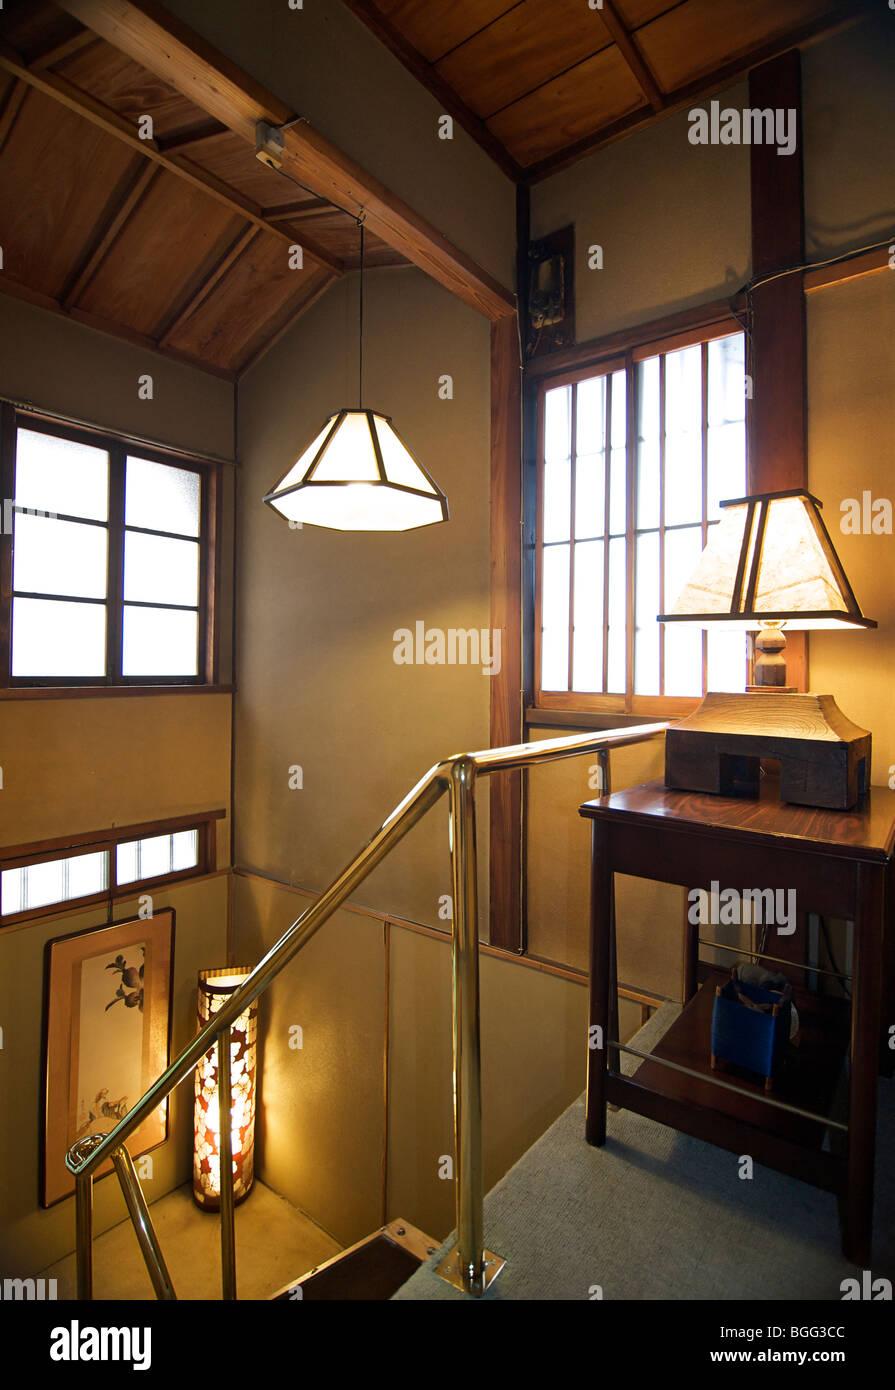 Ishihara ryokan. Kyoto, Japan. Traditional Japanese style guest house. - Stock Image